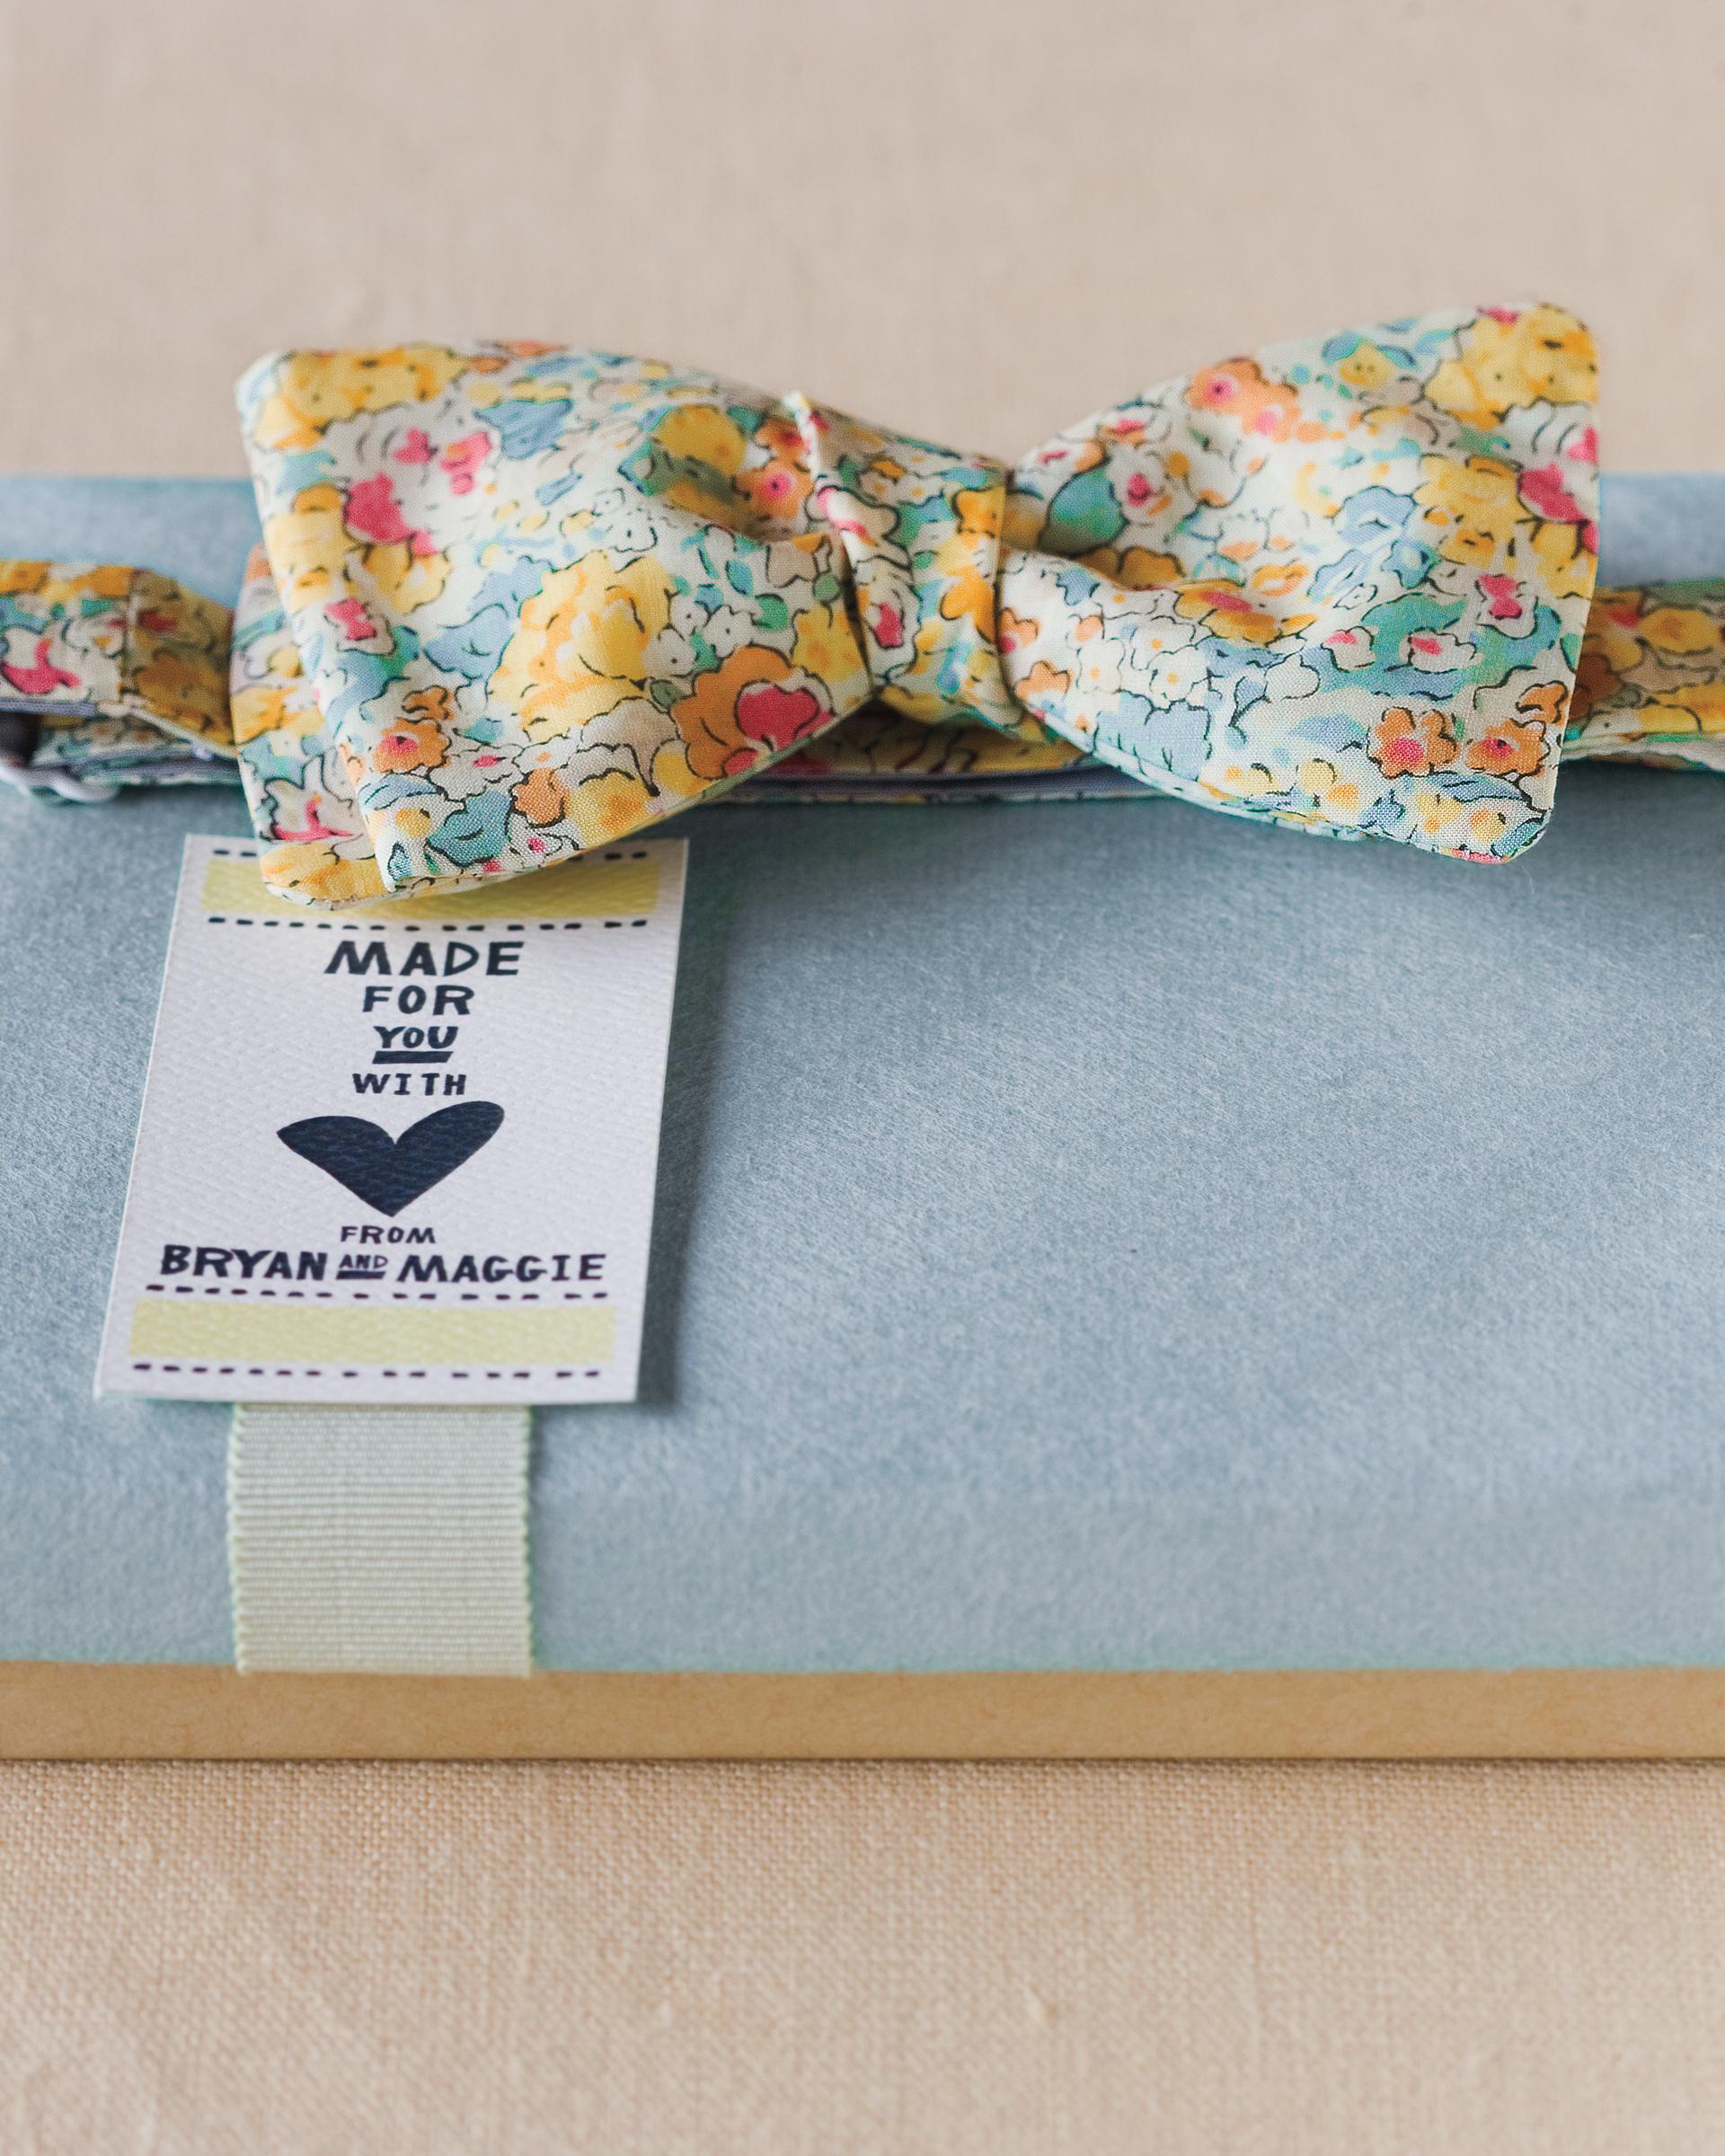 maggie-bryan-bowtie-with-box-0015-mwd108897.jpg